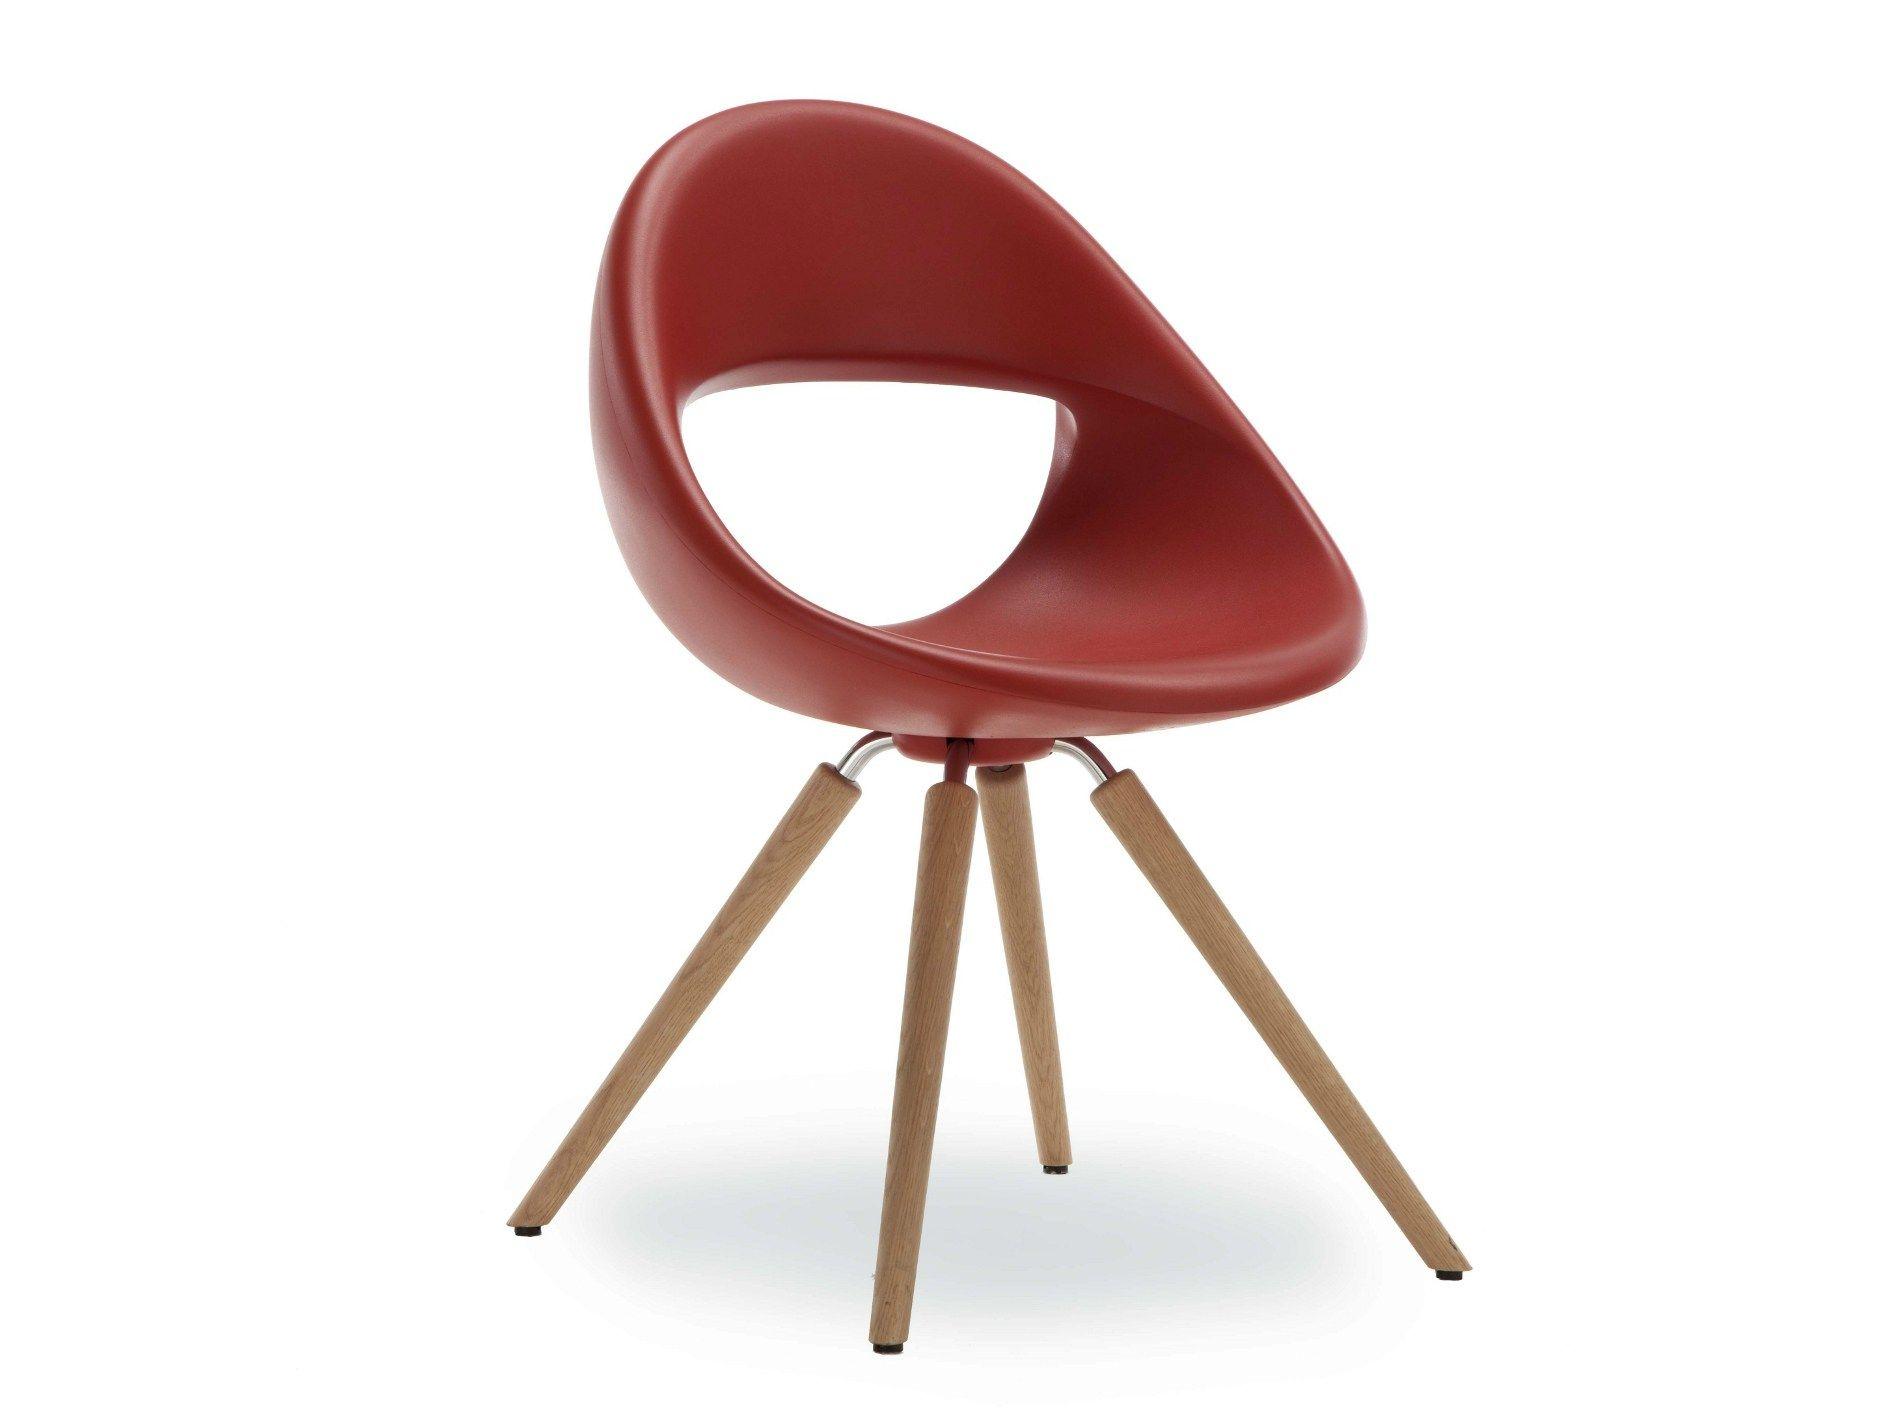 lucky 906 chair by tonon design martin ballendat. Black Bedroom Furniture Sets. Home Design Ideas